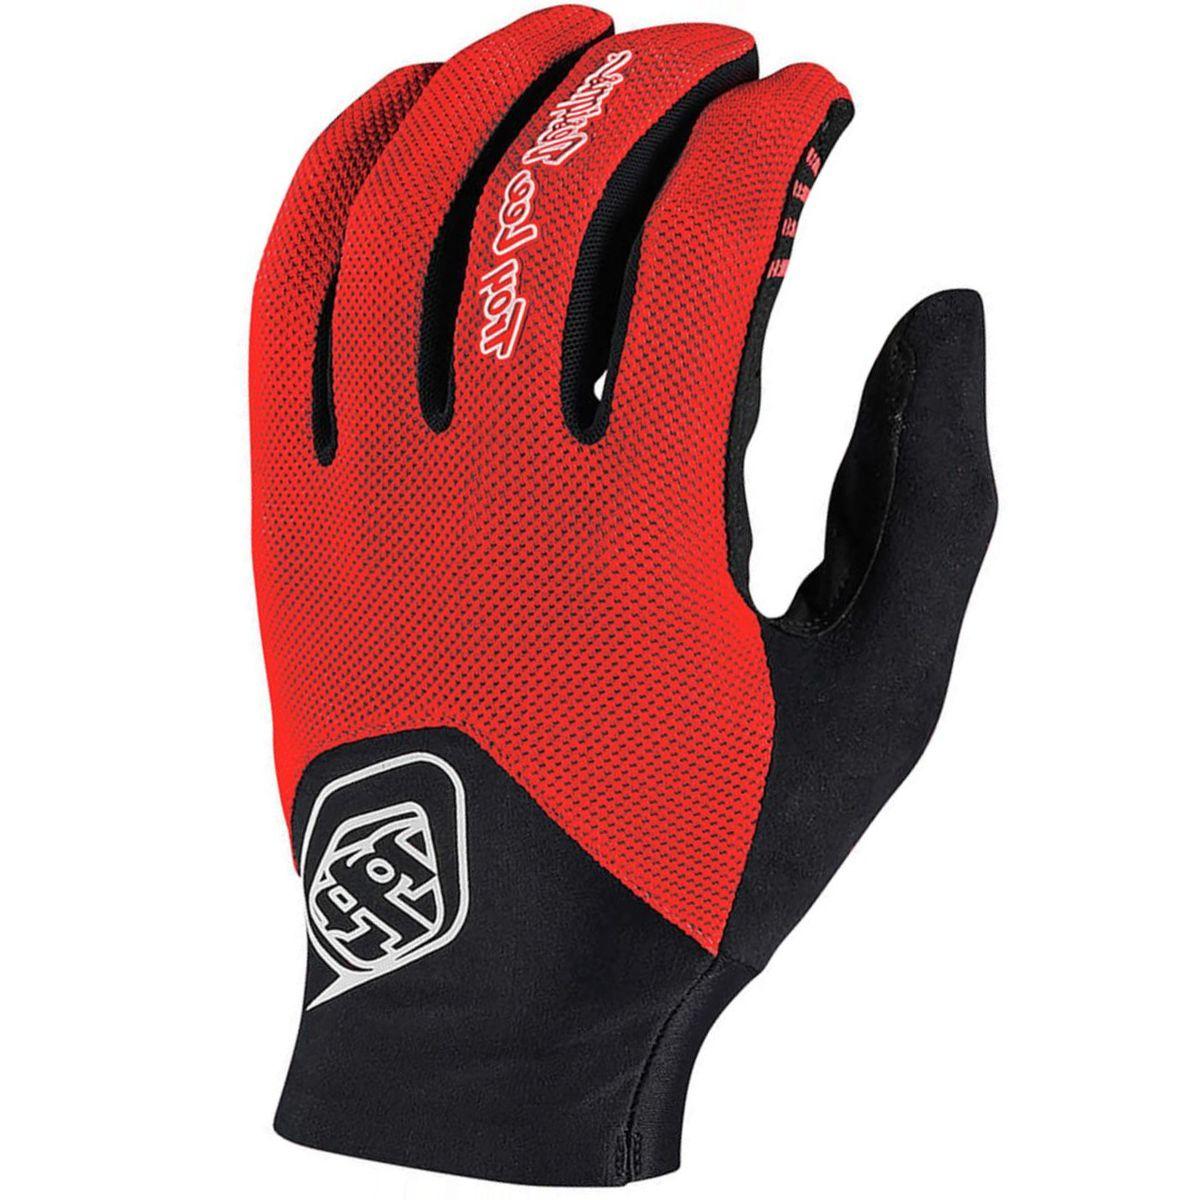 Troy Lee Designs Ace 2.0 Glove - Men's